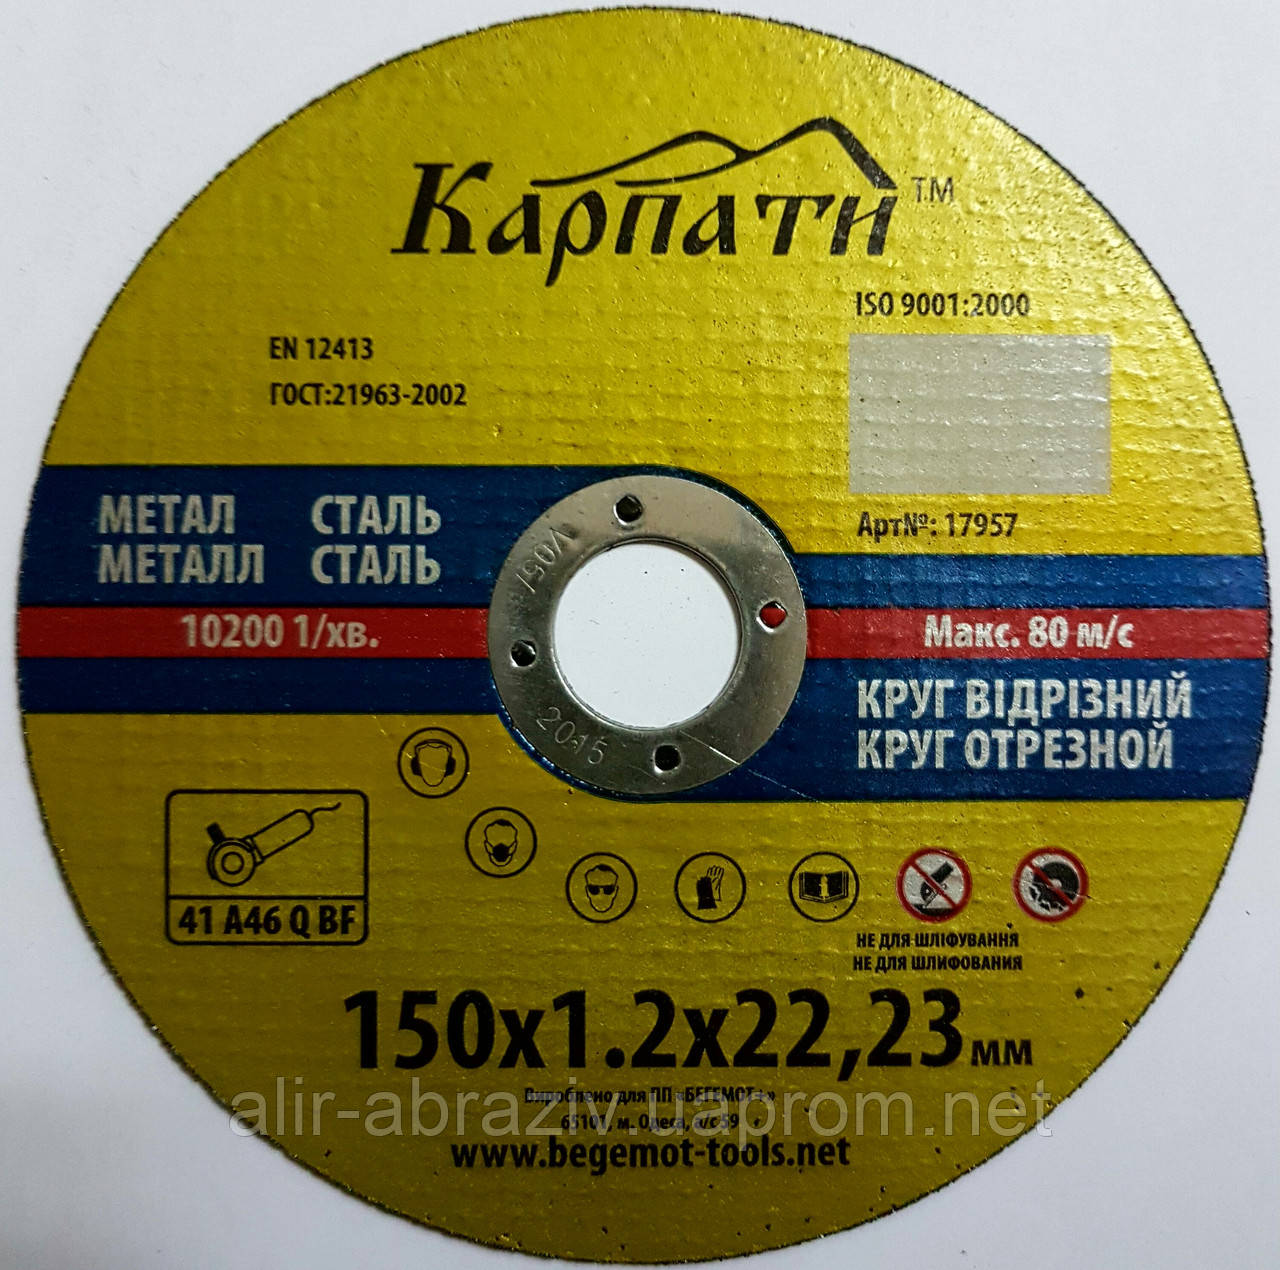 Круг отрезной по металлу Карпаты 150 x 1,6 x 22